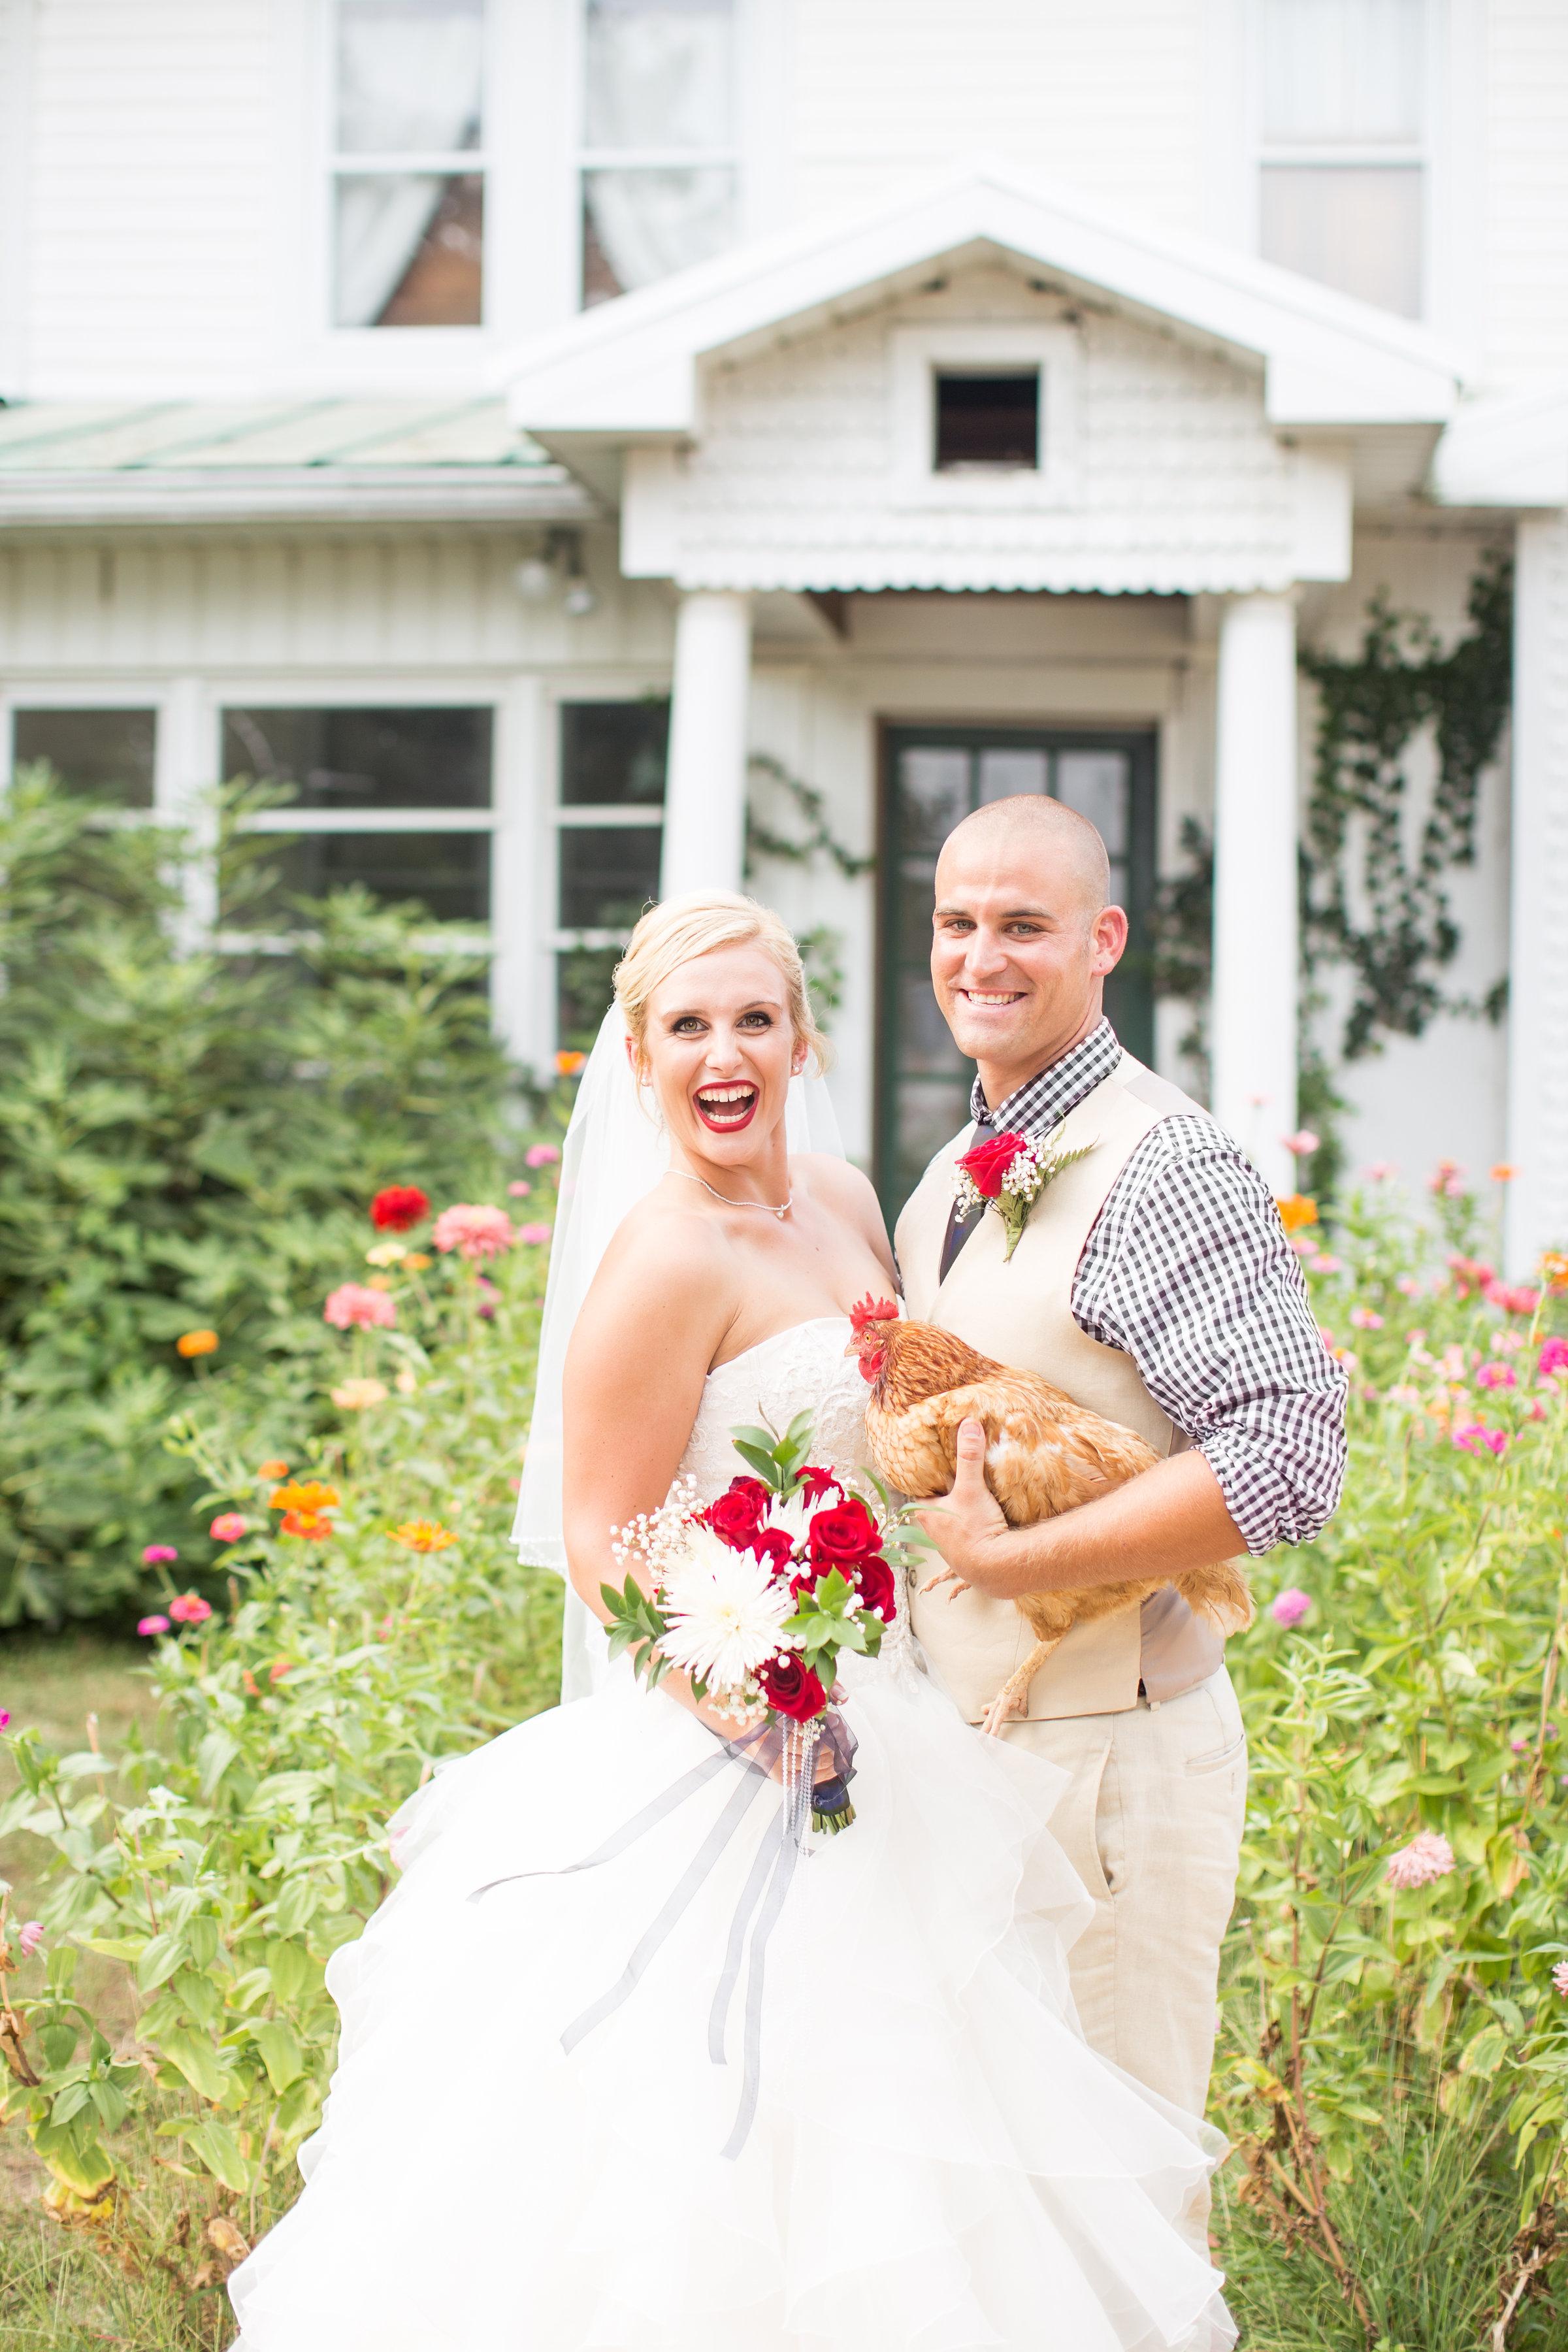 chicken-wedding-bride-groom-country-wedding-photos.jpg